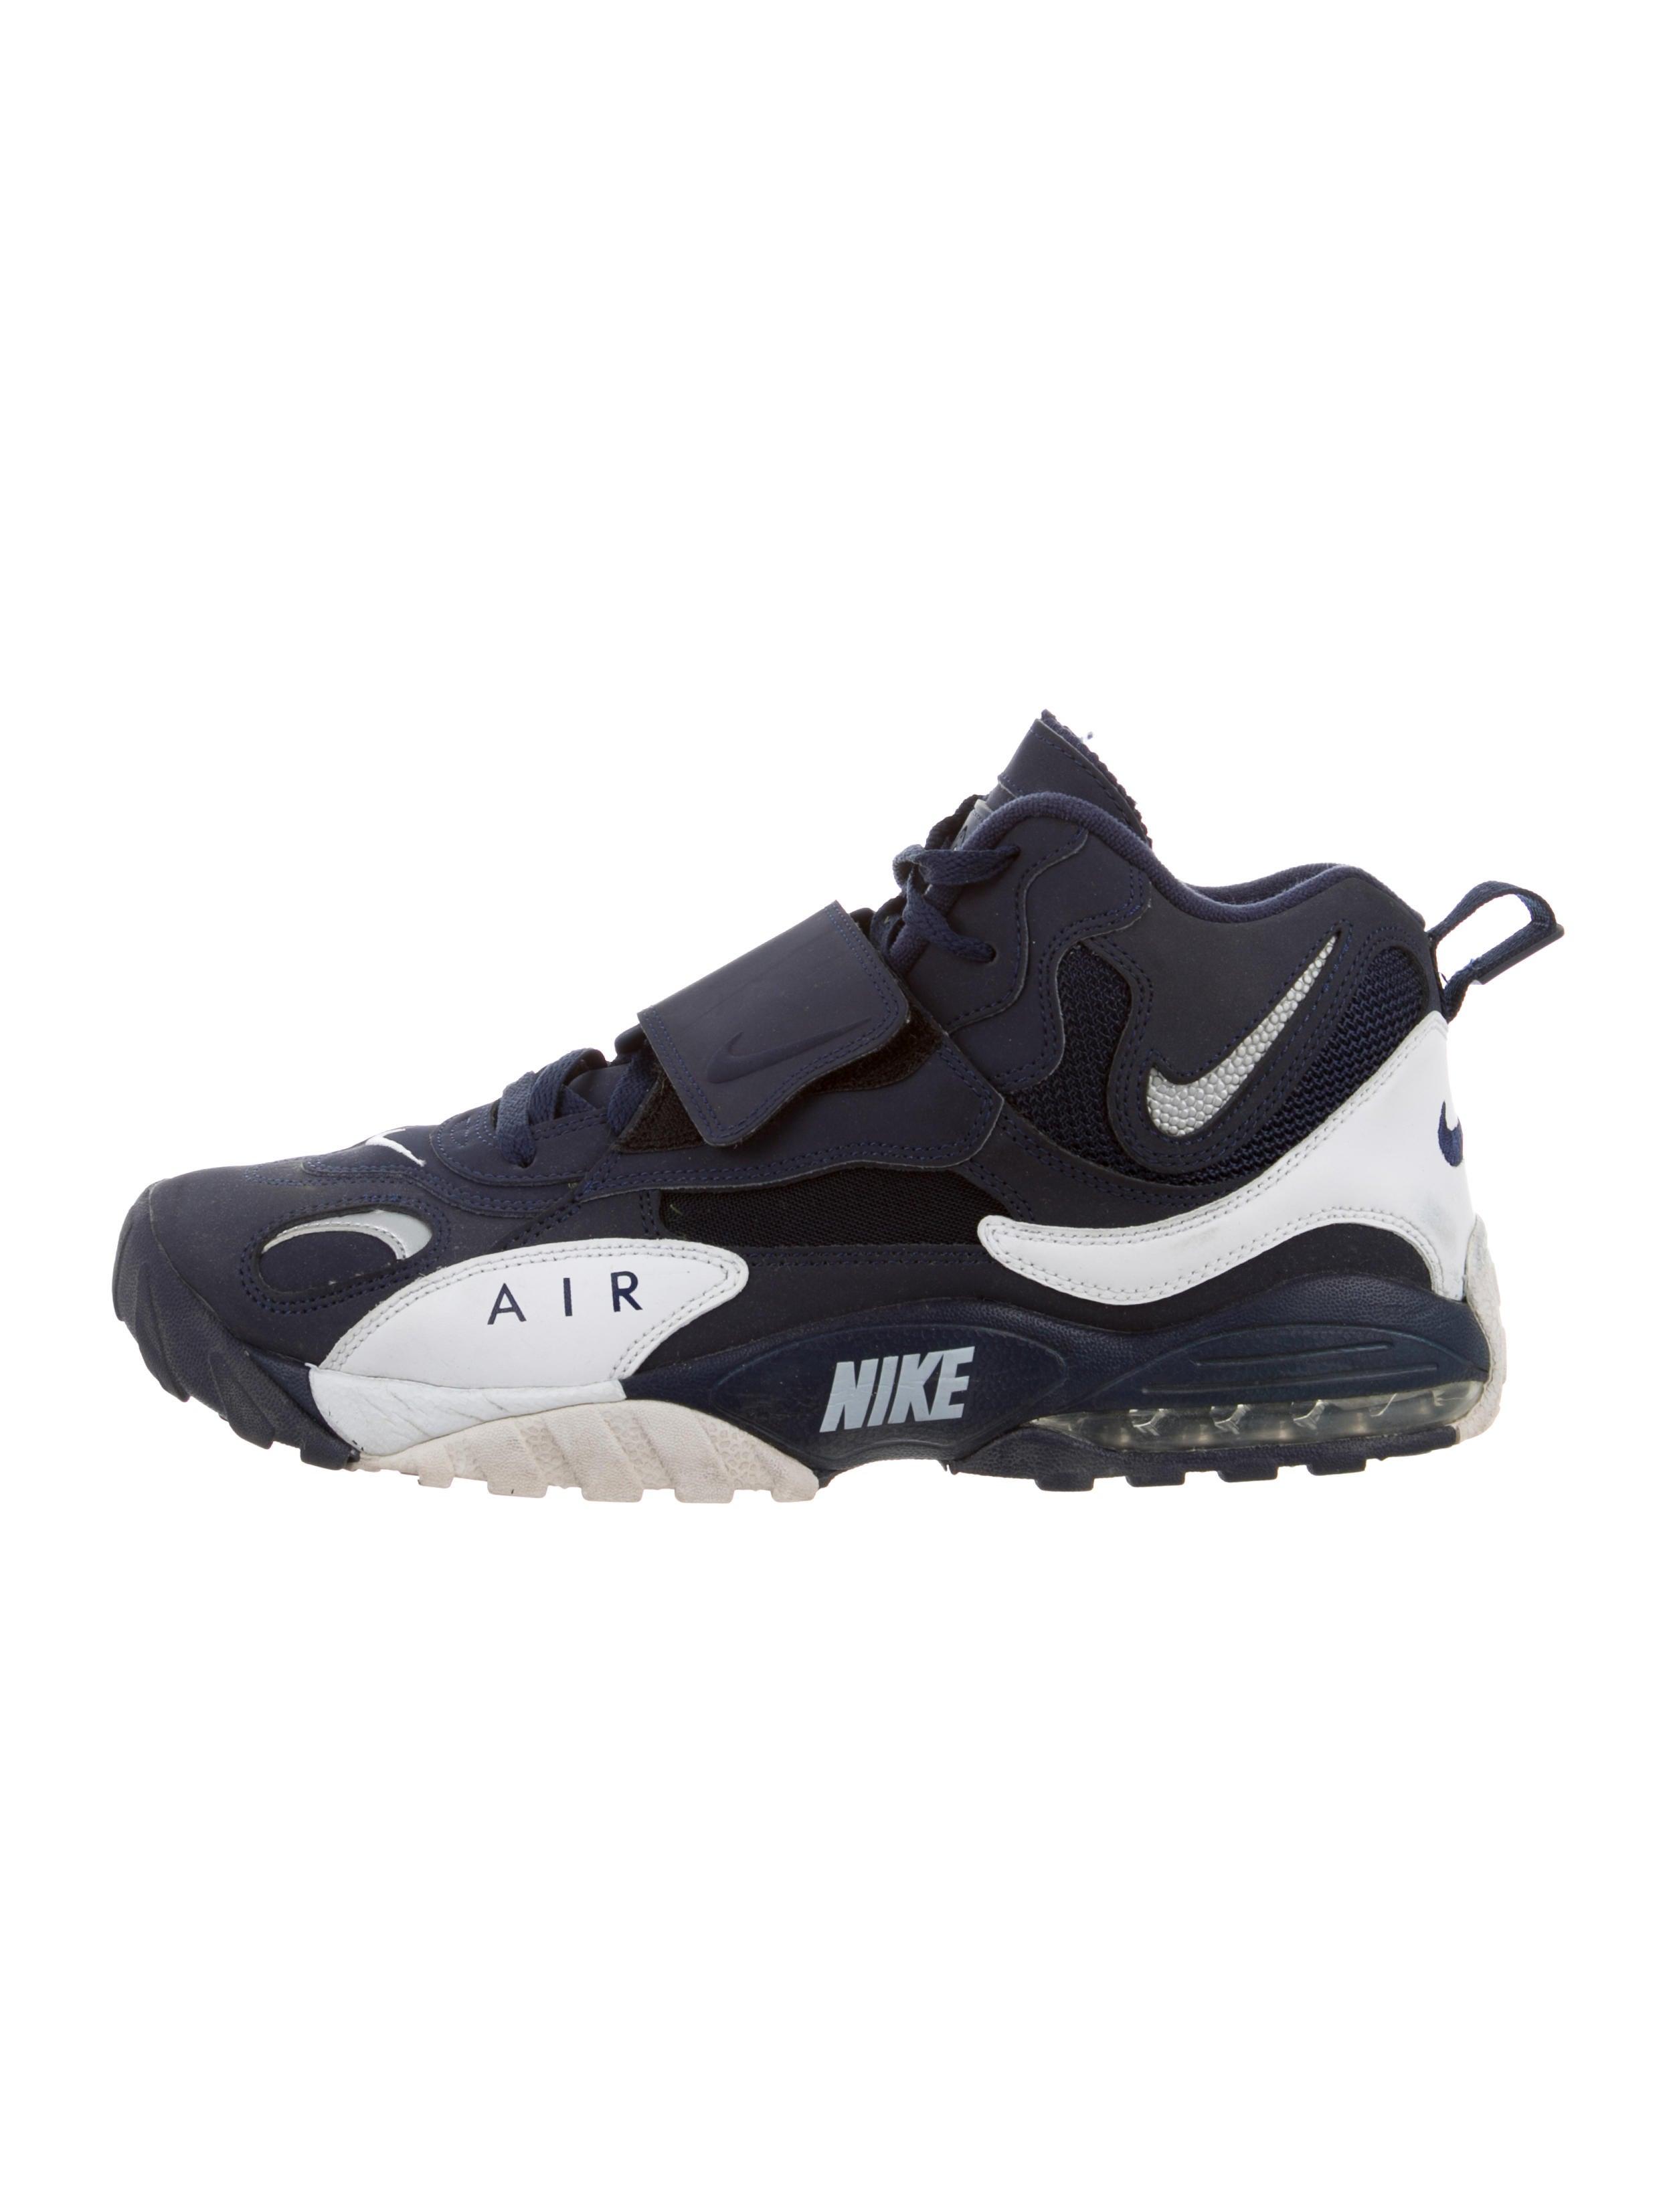 45cdaf547a2 ... nike vapor speed turf mens football turf shoes white 4c648 f876d   cheapest air max speed turf dallas cowboys sneakers 8ae7c e0496